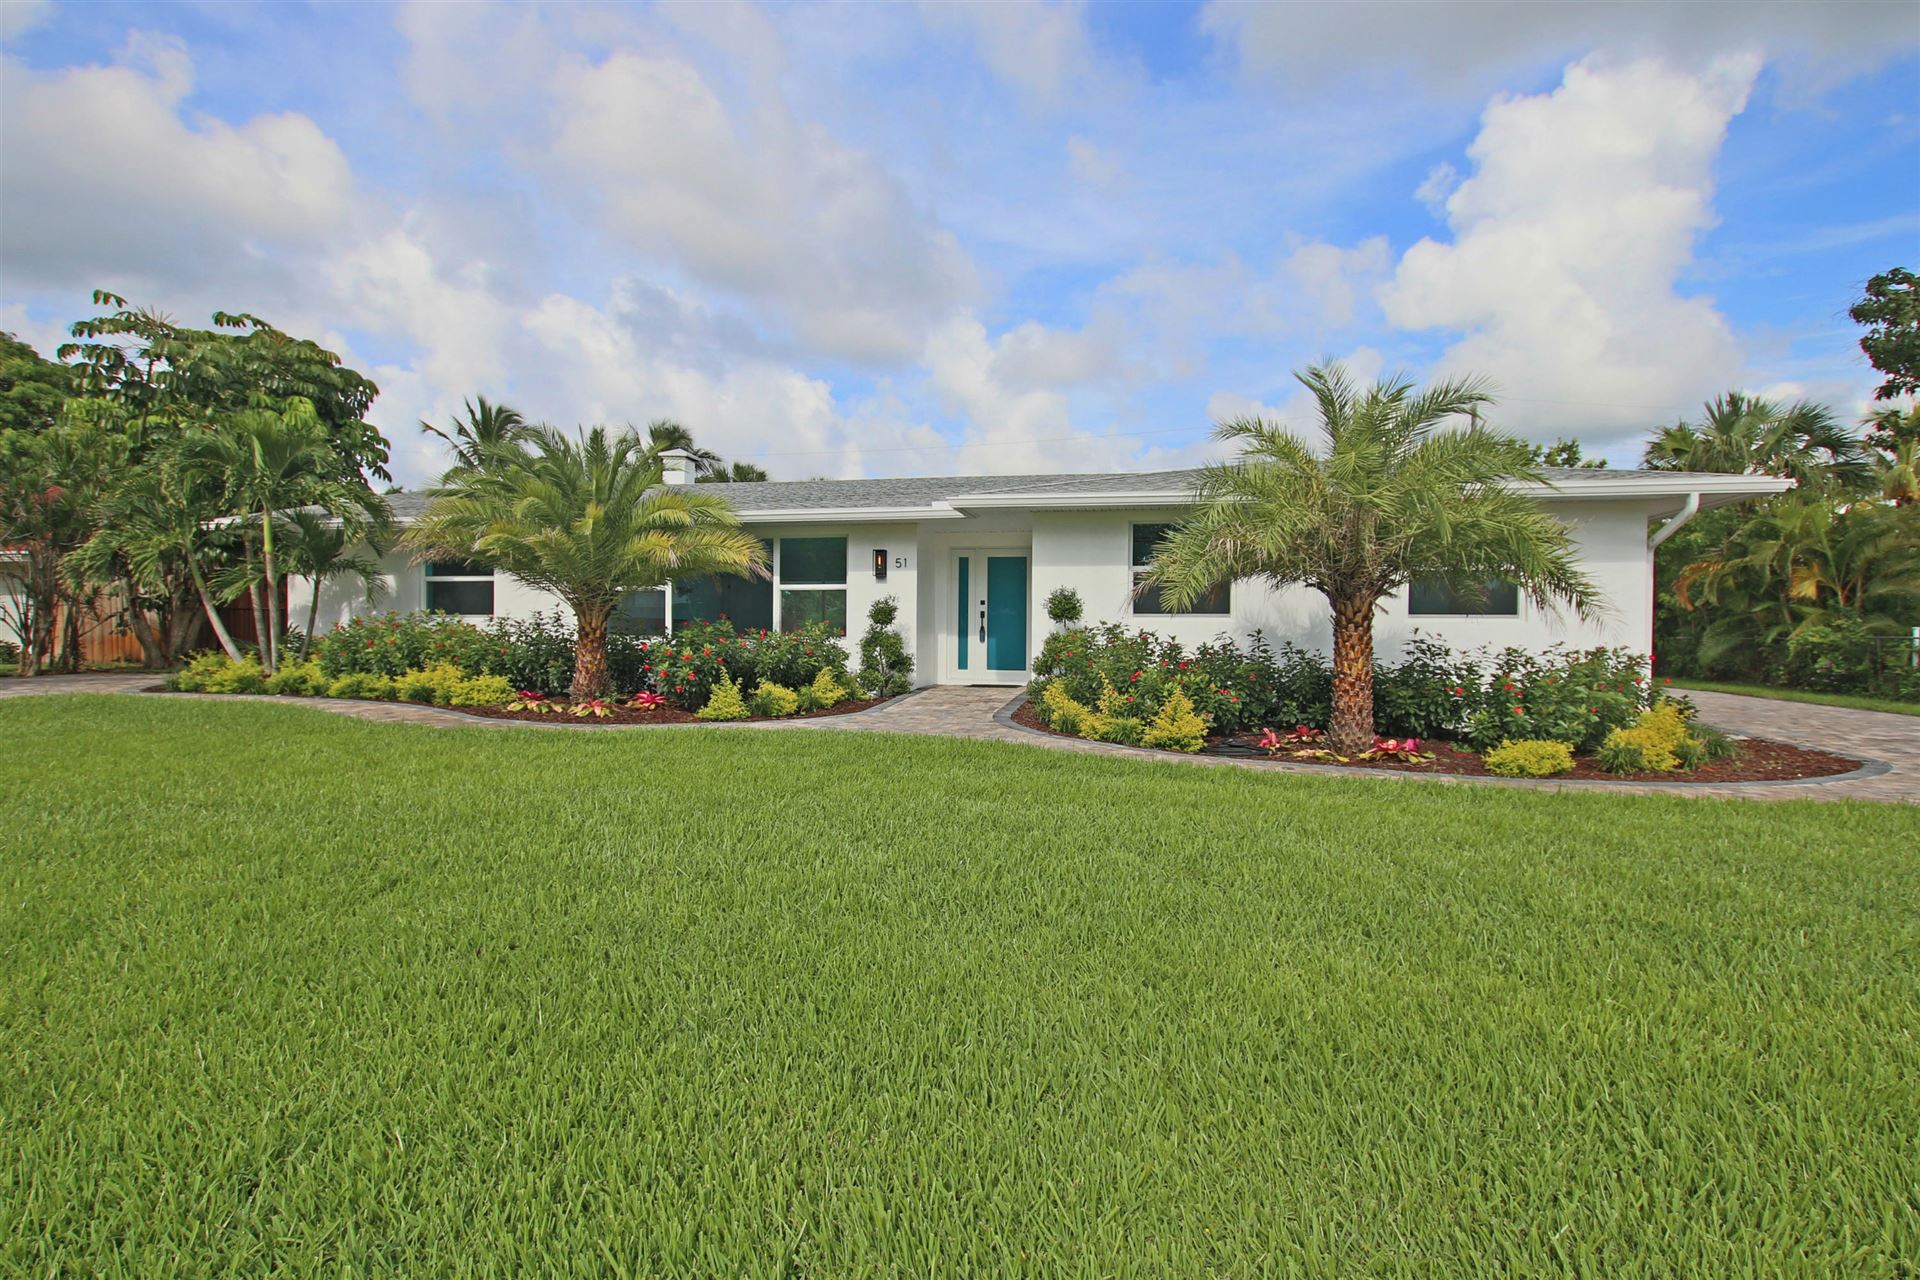 51 Pinetree Place, Tequesta, FL 33469 - #: RX-10648389